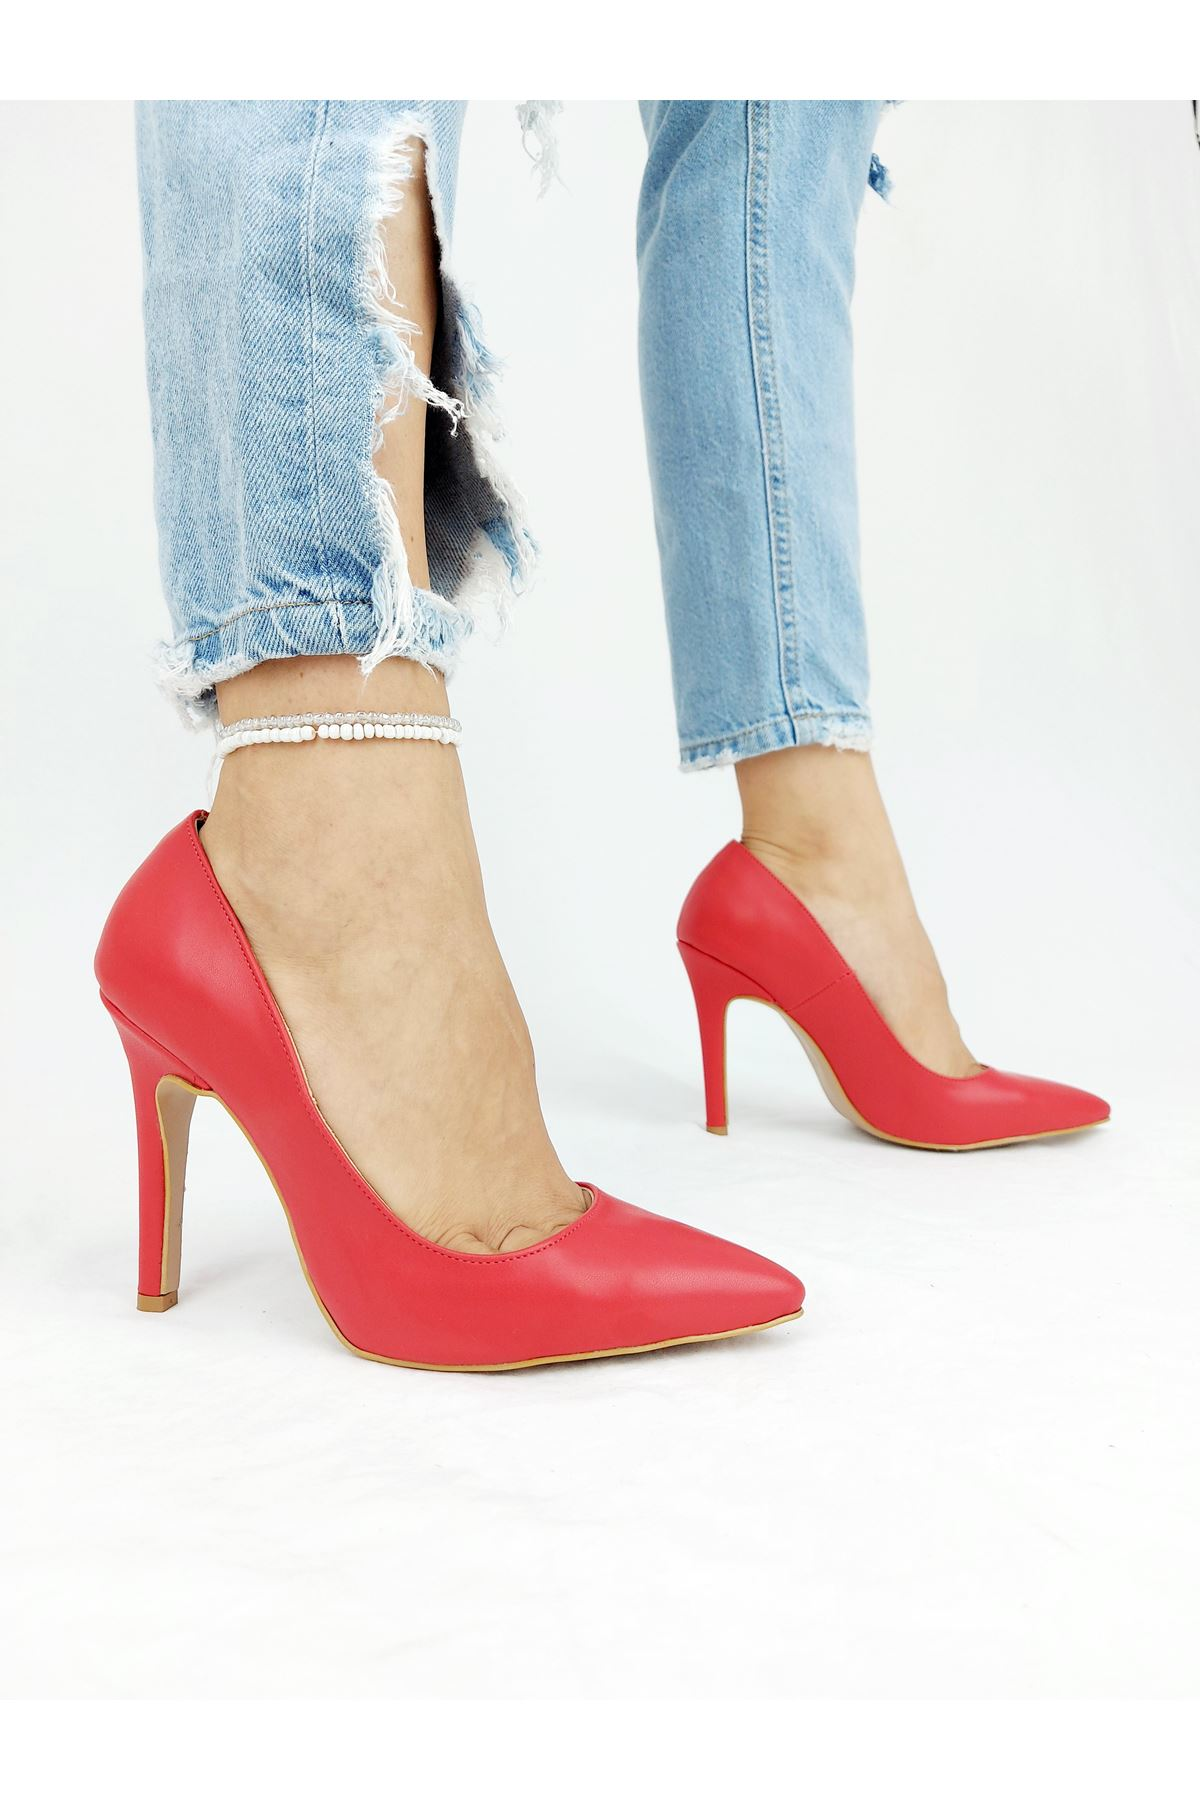 Tokyo Kırmızı Cilt Stiletto